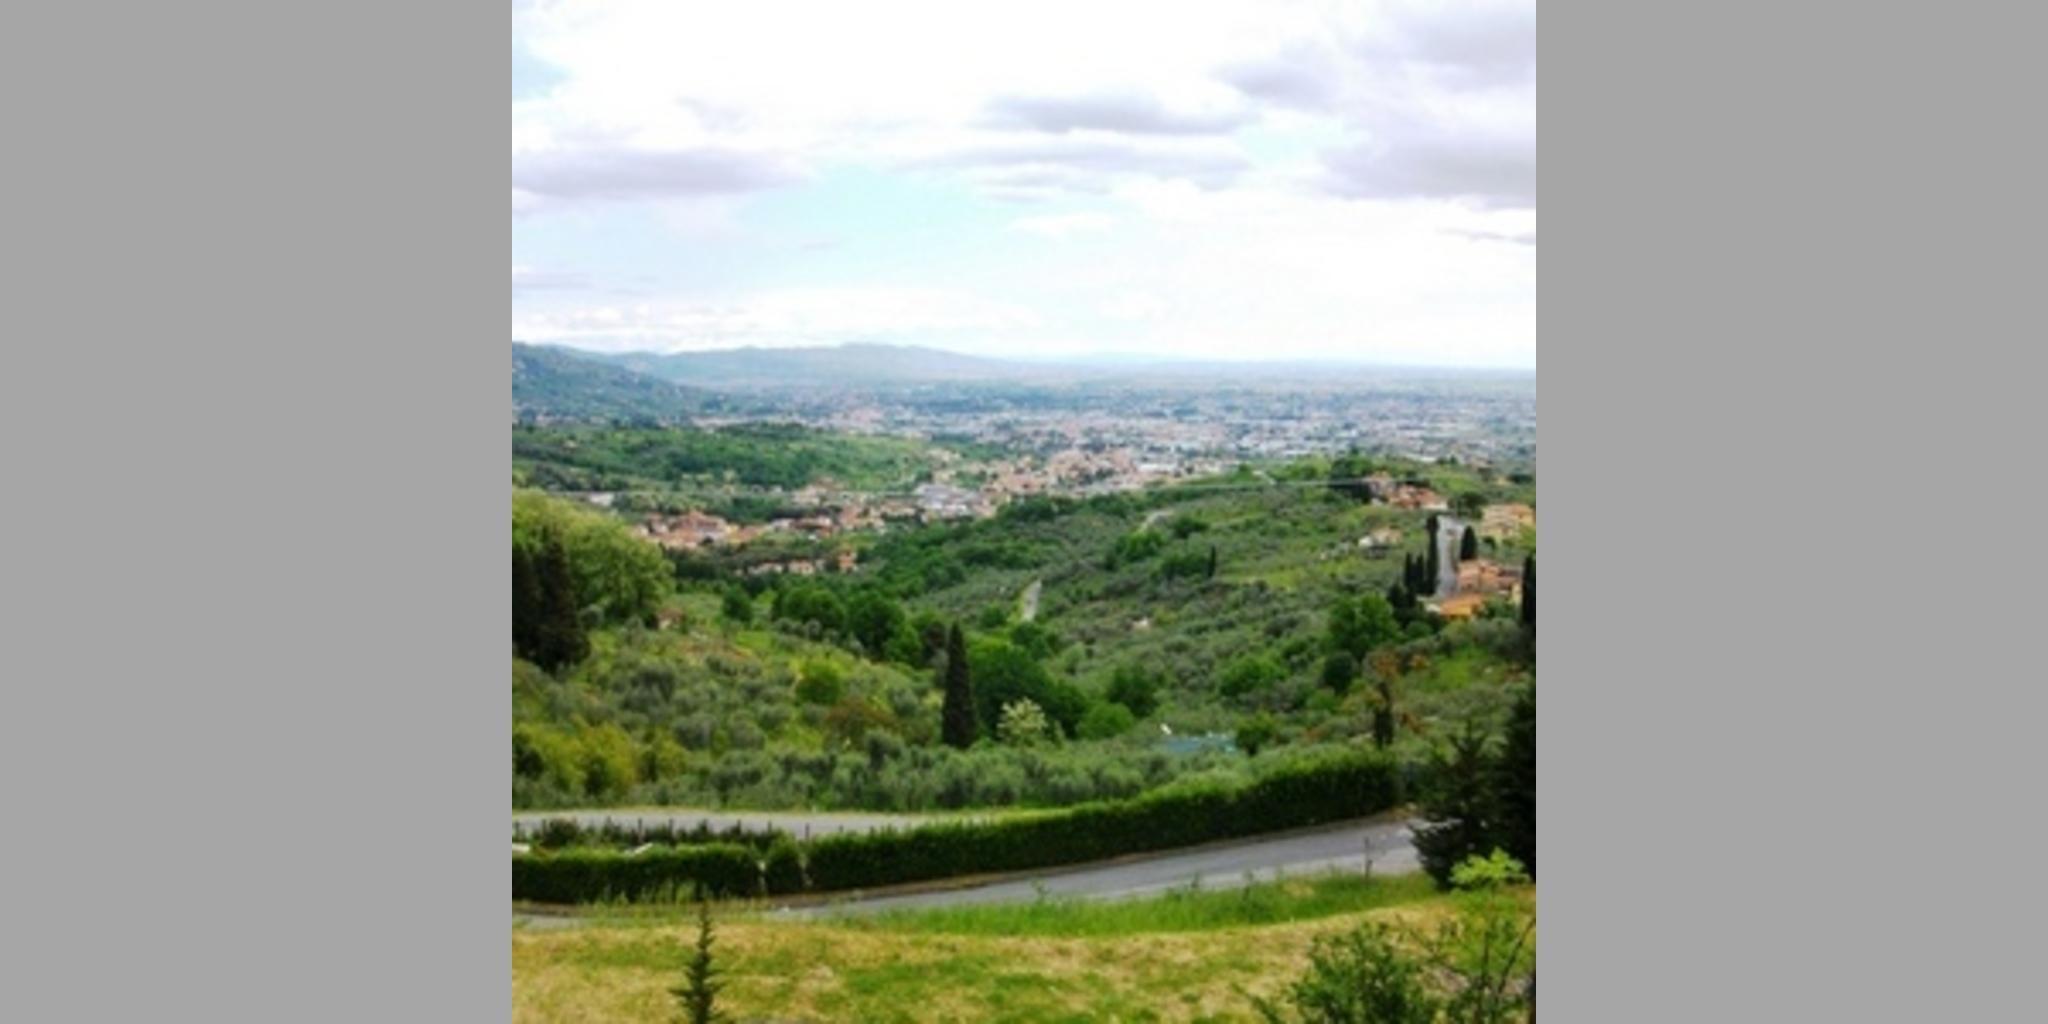 Bed & Breakfast Capannori - San Gennaro  Capannori